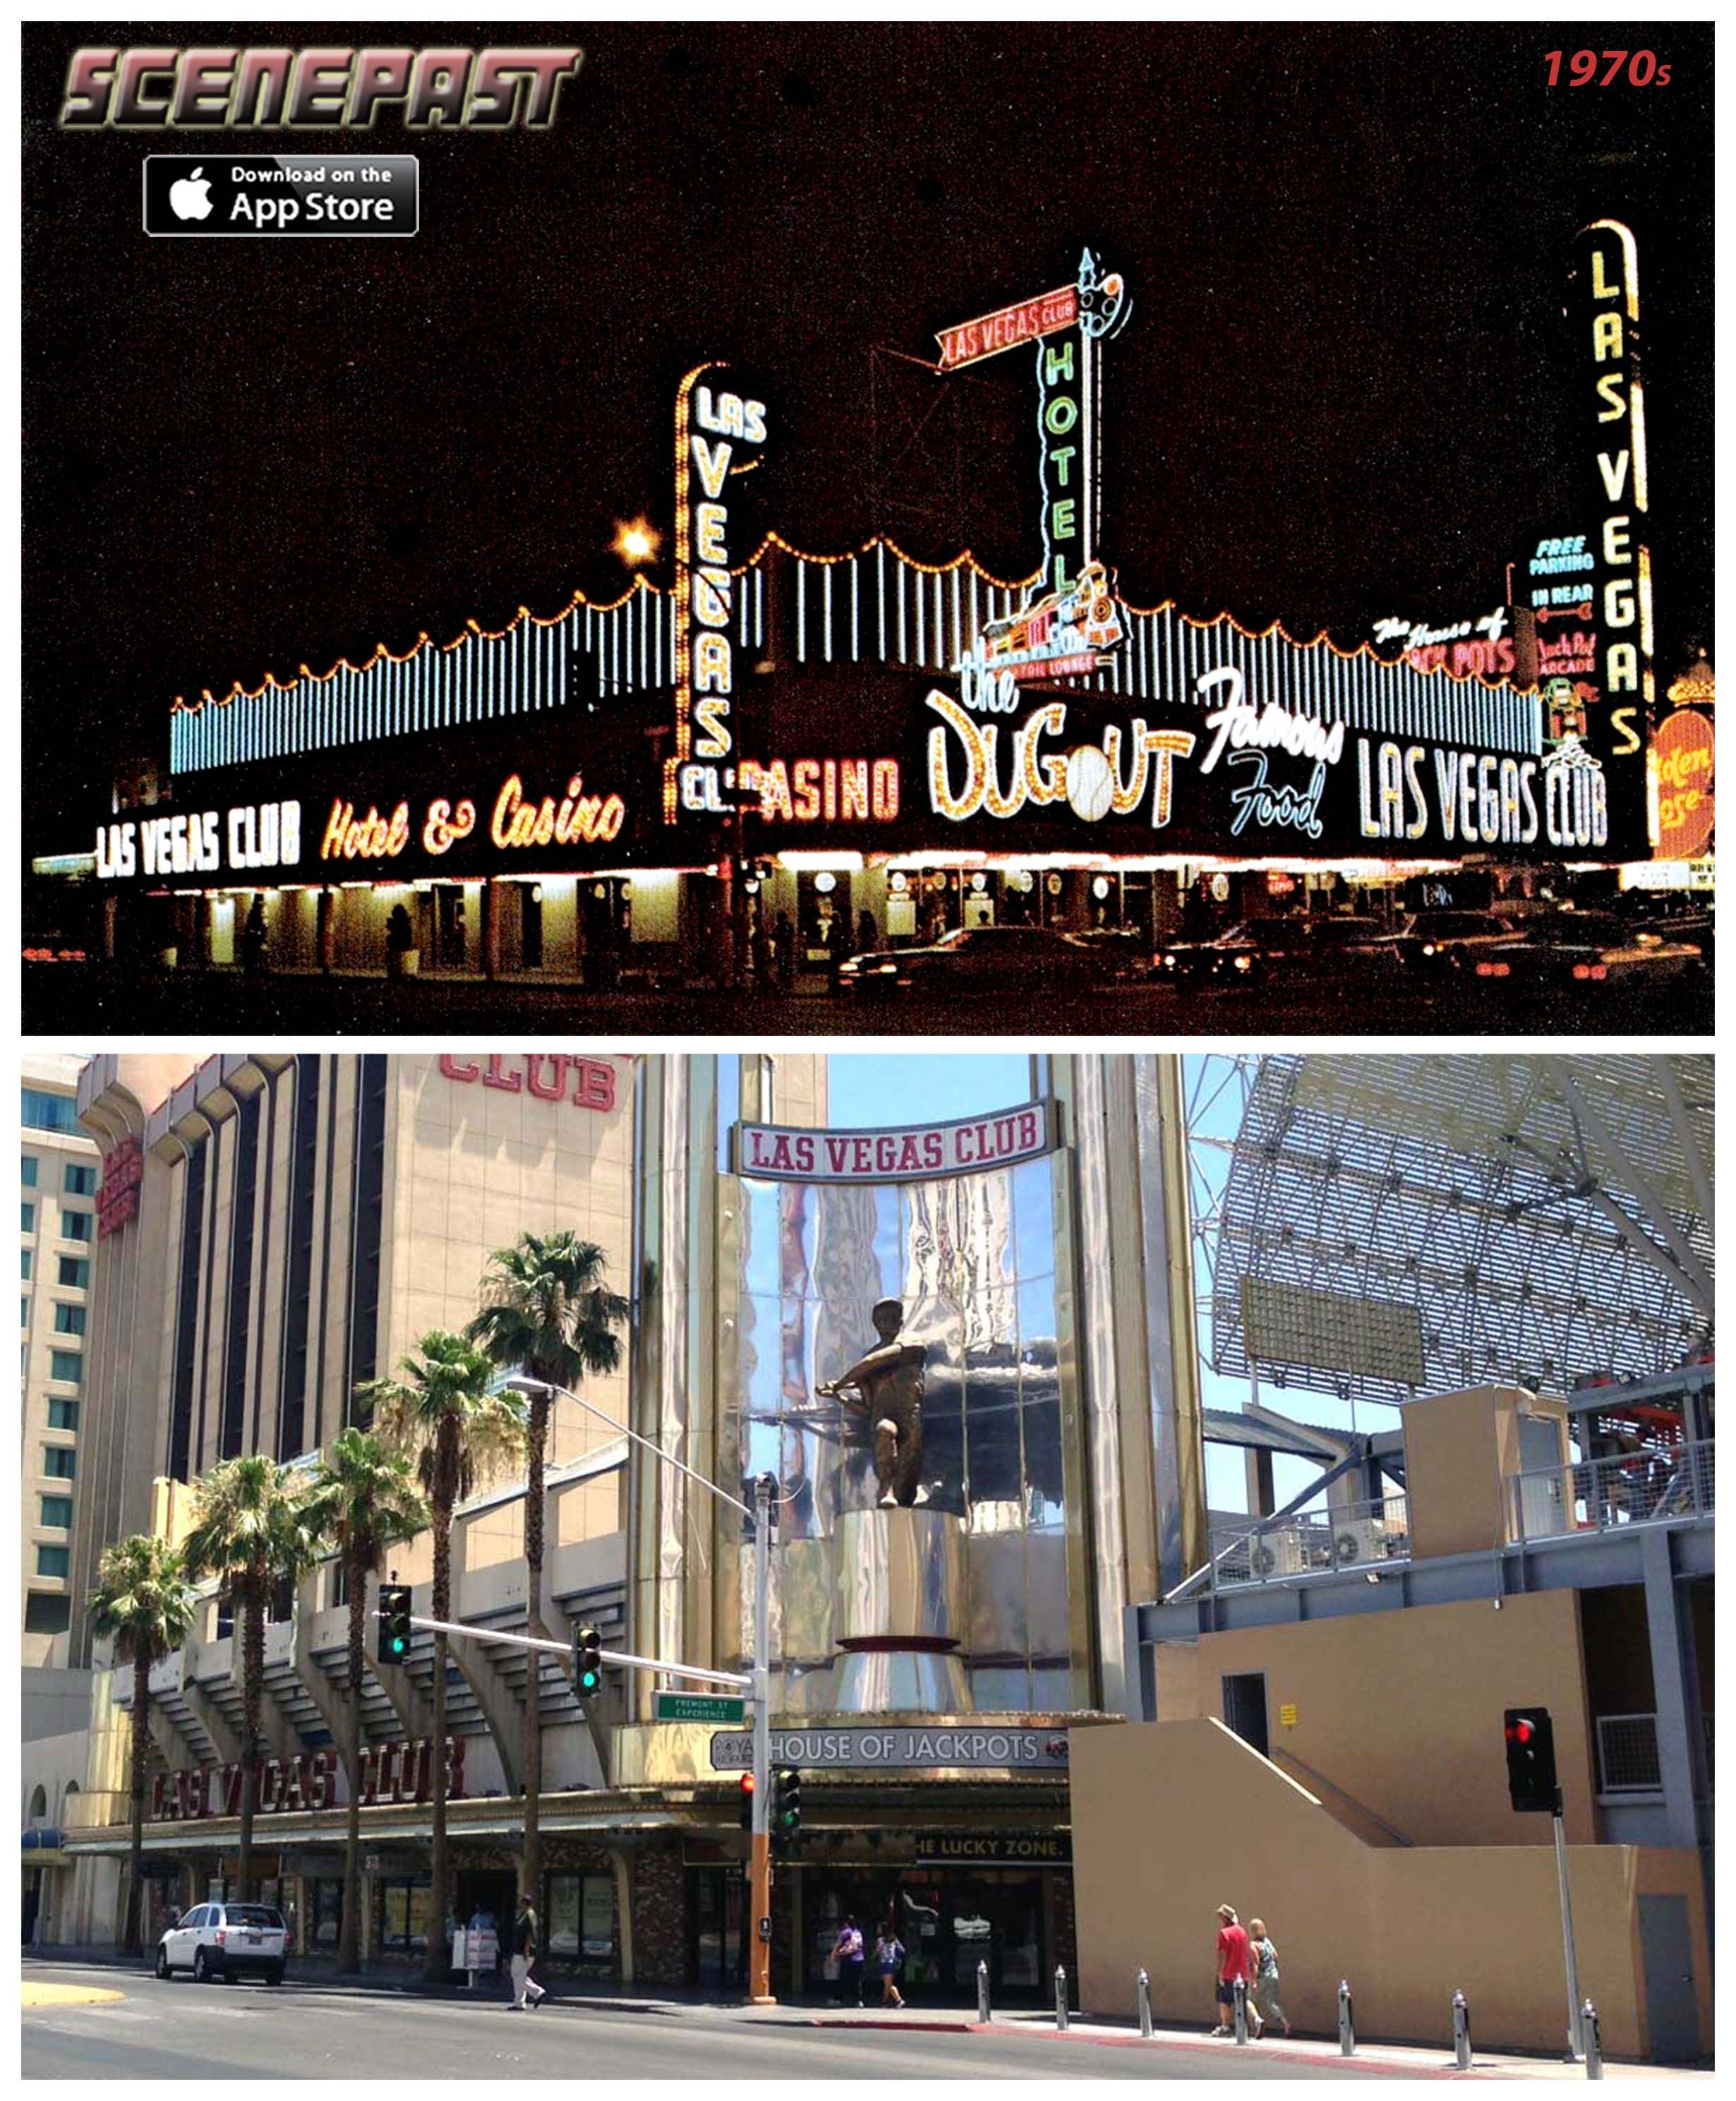 The 400 room Las Vegas Club Hotel closed last year. The